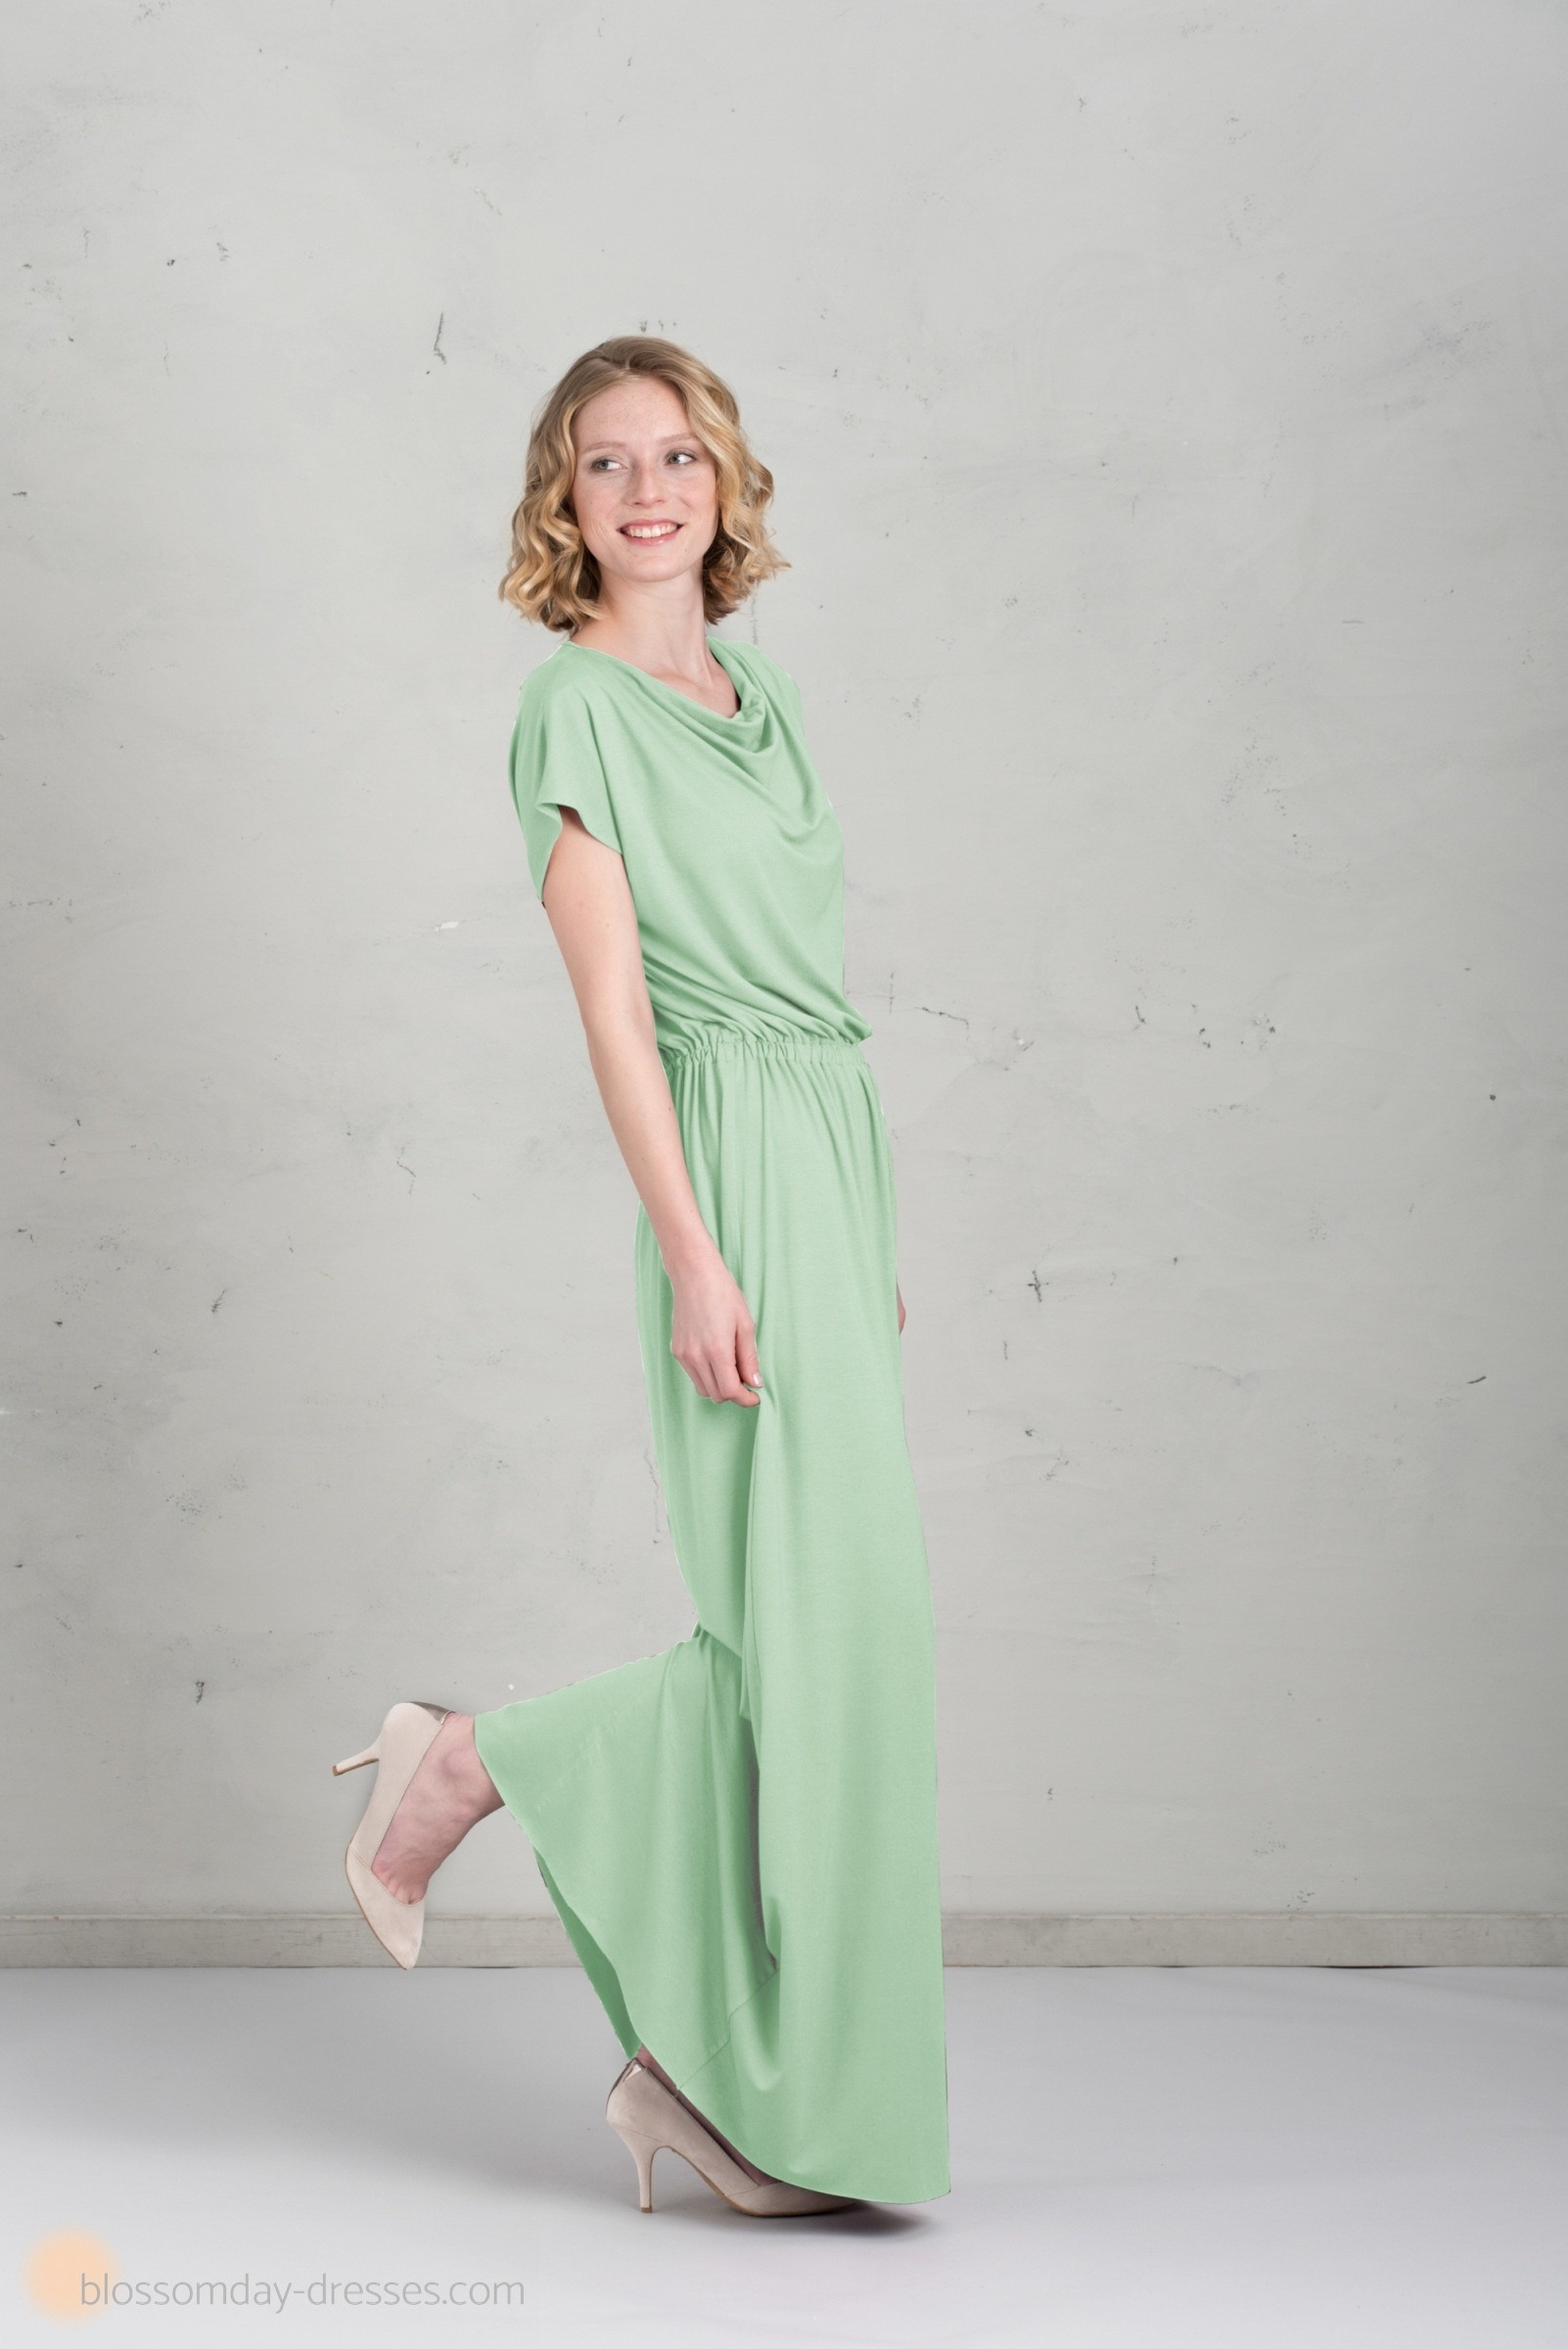 10 Luxurius Kleid Mintgrün Kurz Vertrieb15 Luxus Kleid Mintgrün Kurz Boutique